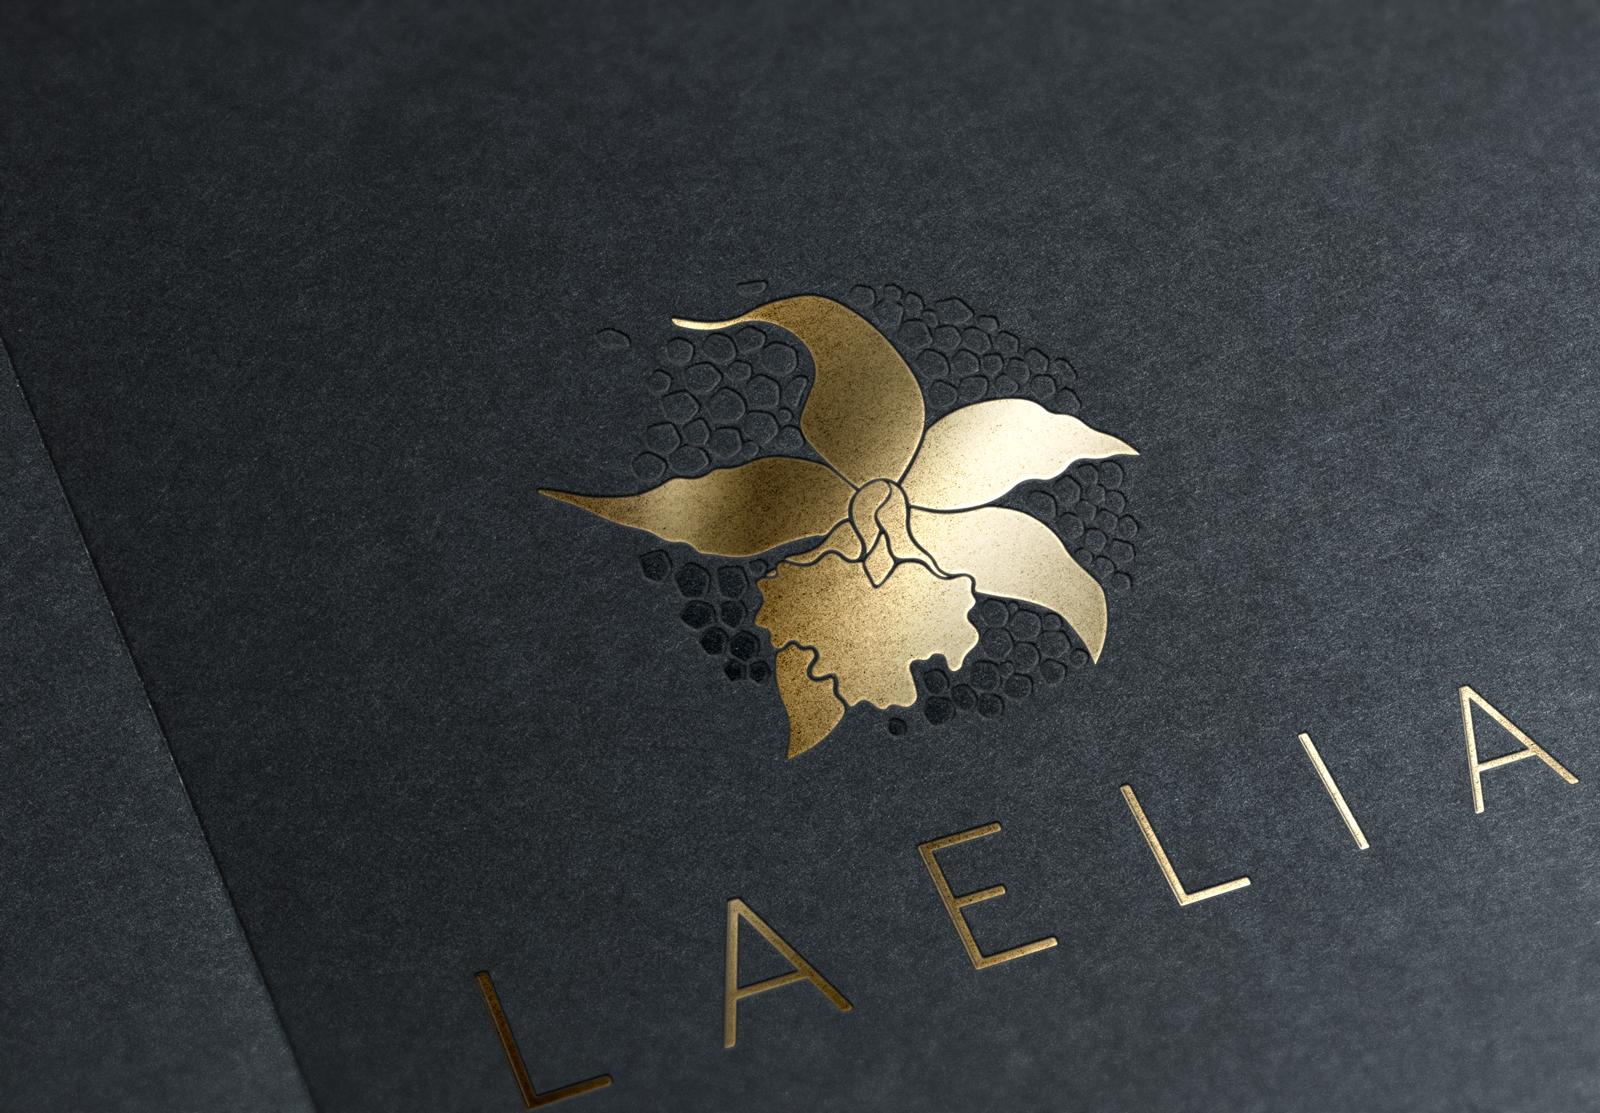 Laelia_2